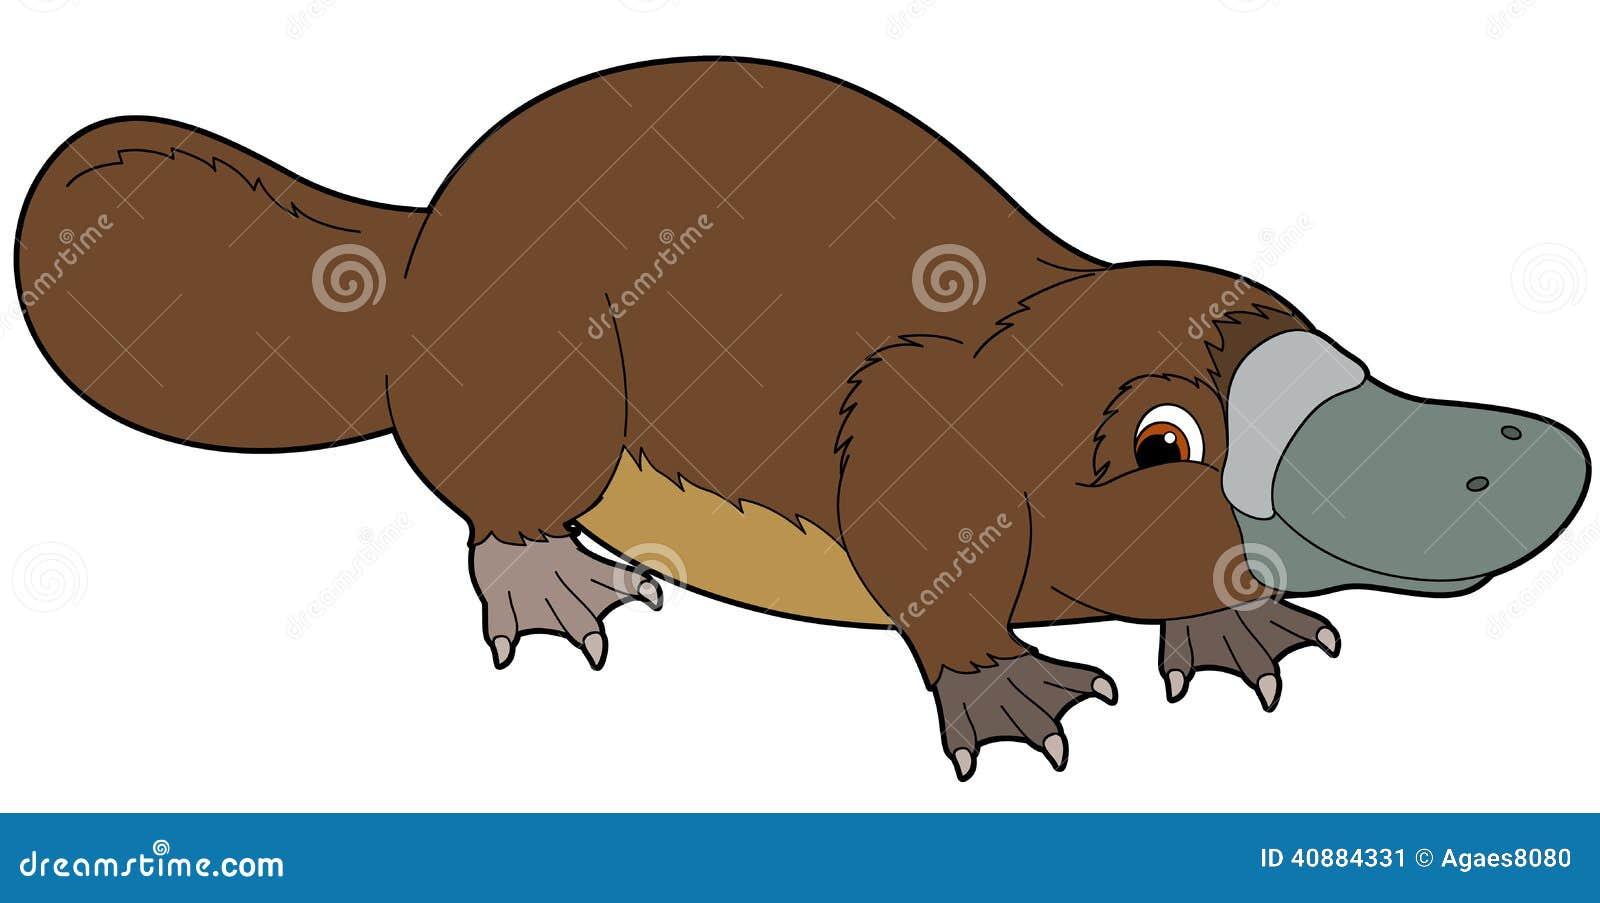 Clip Art Platypus Clipart platypus stock illustrations 297 cartoon animal illustration for the children image